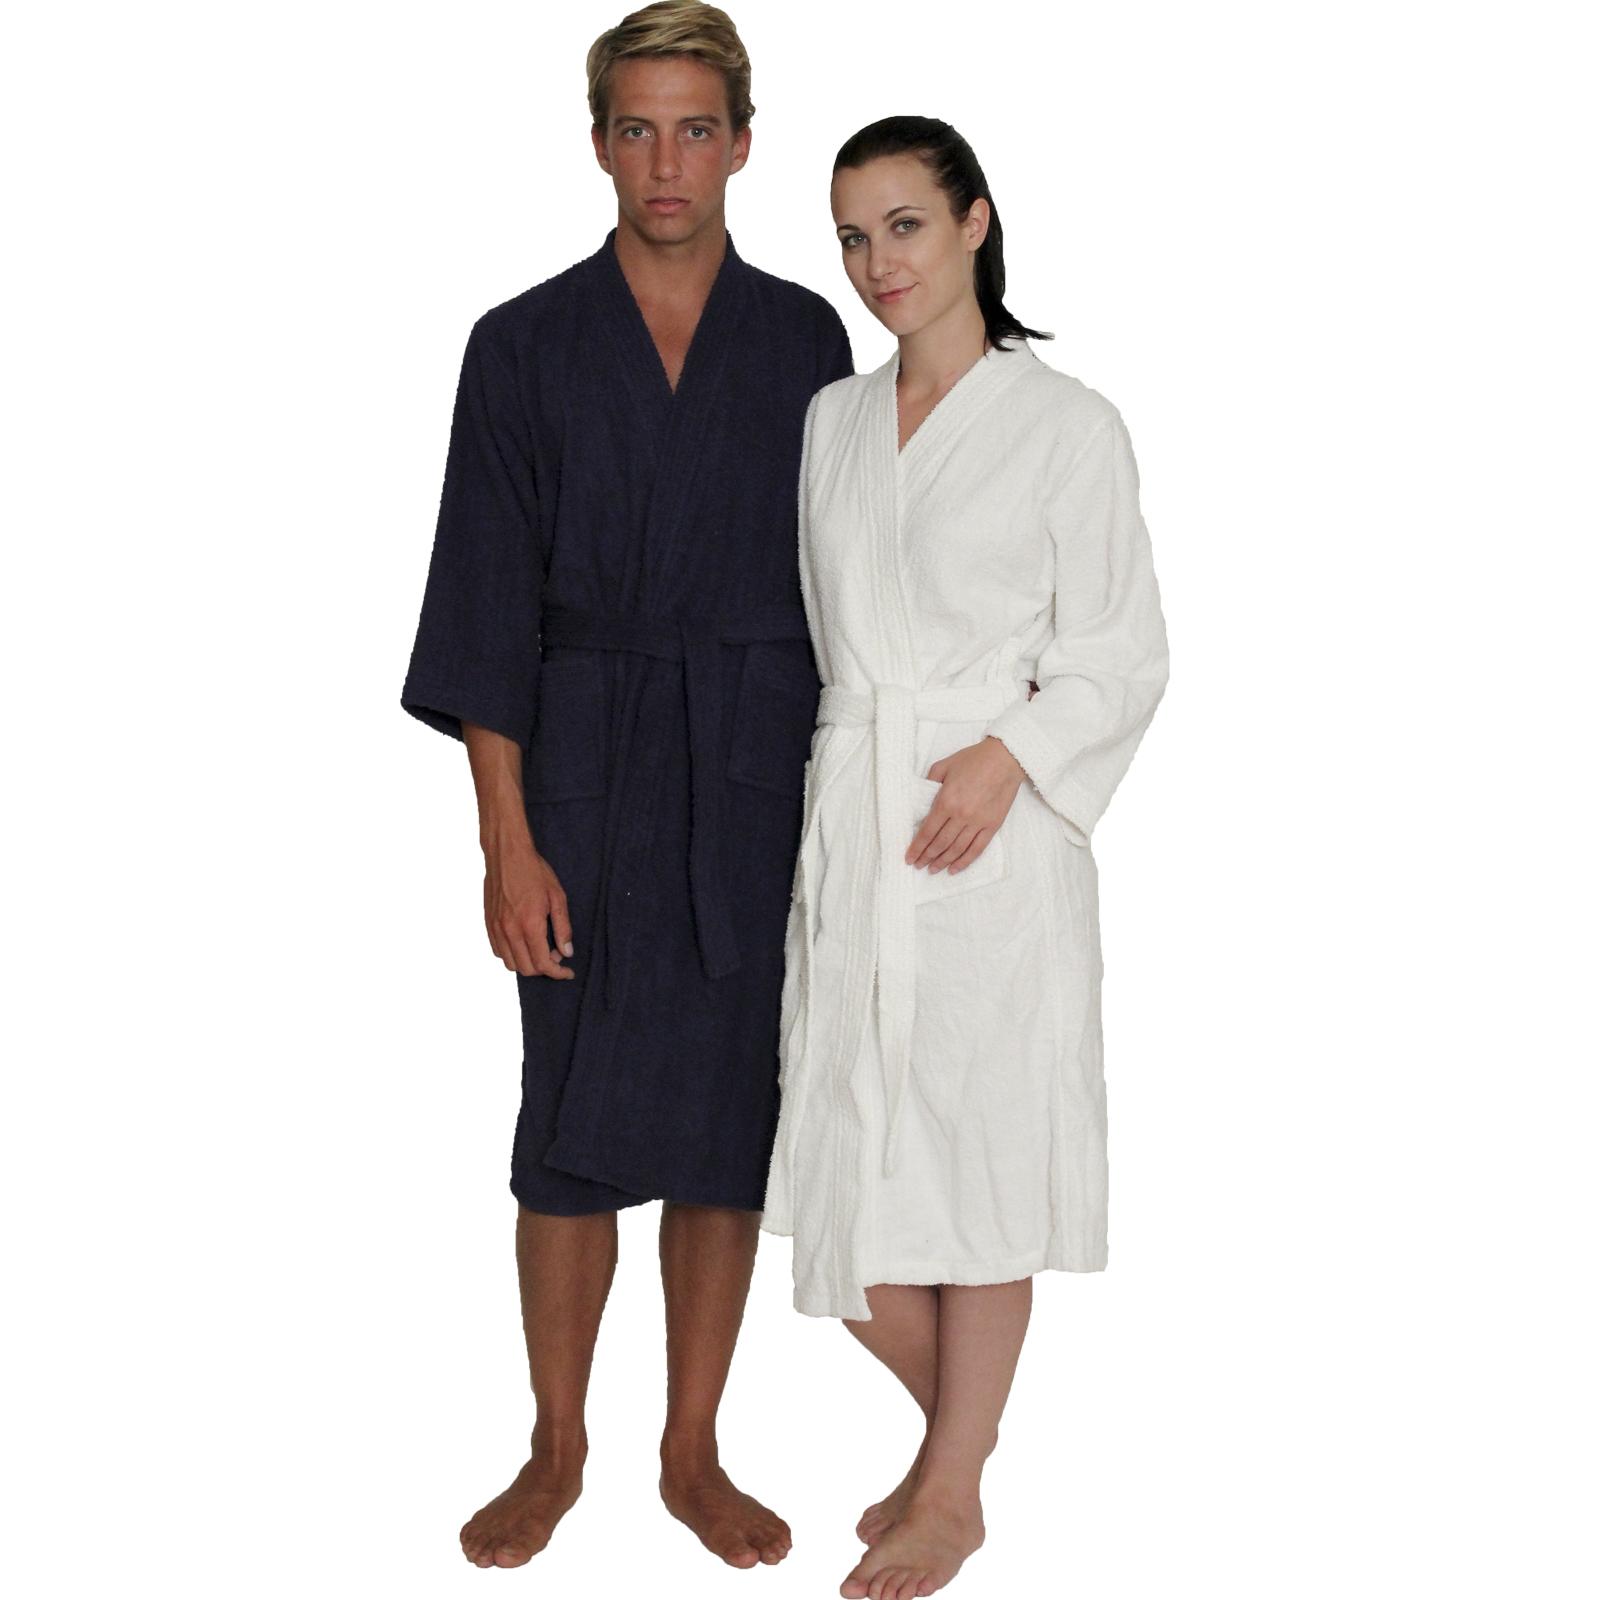 ec98f8bb5e Men s and Women s Terry Cloth Kimono Robe 100% cotton